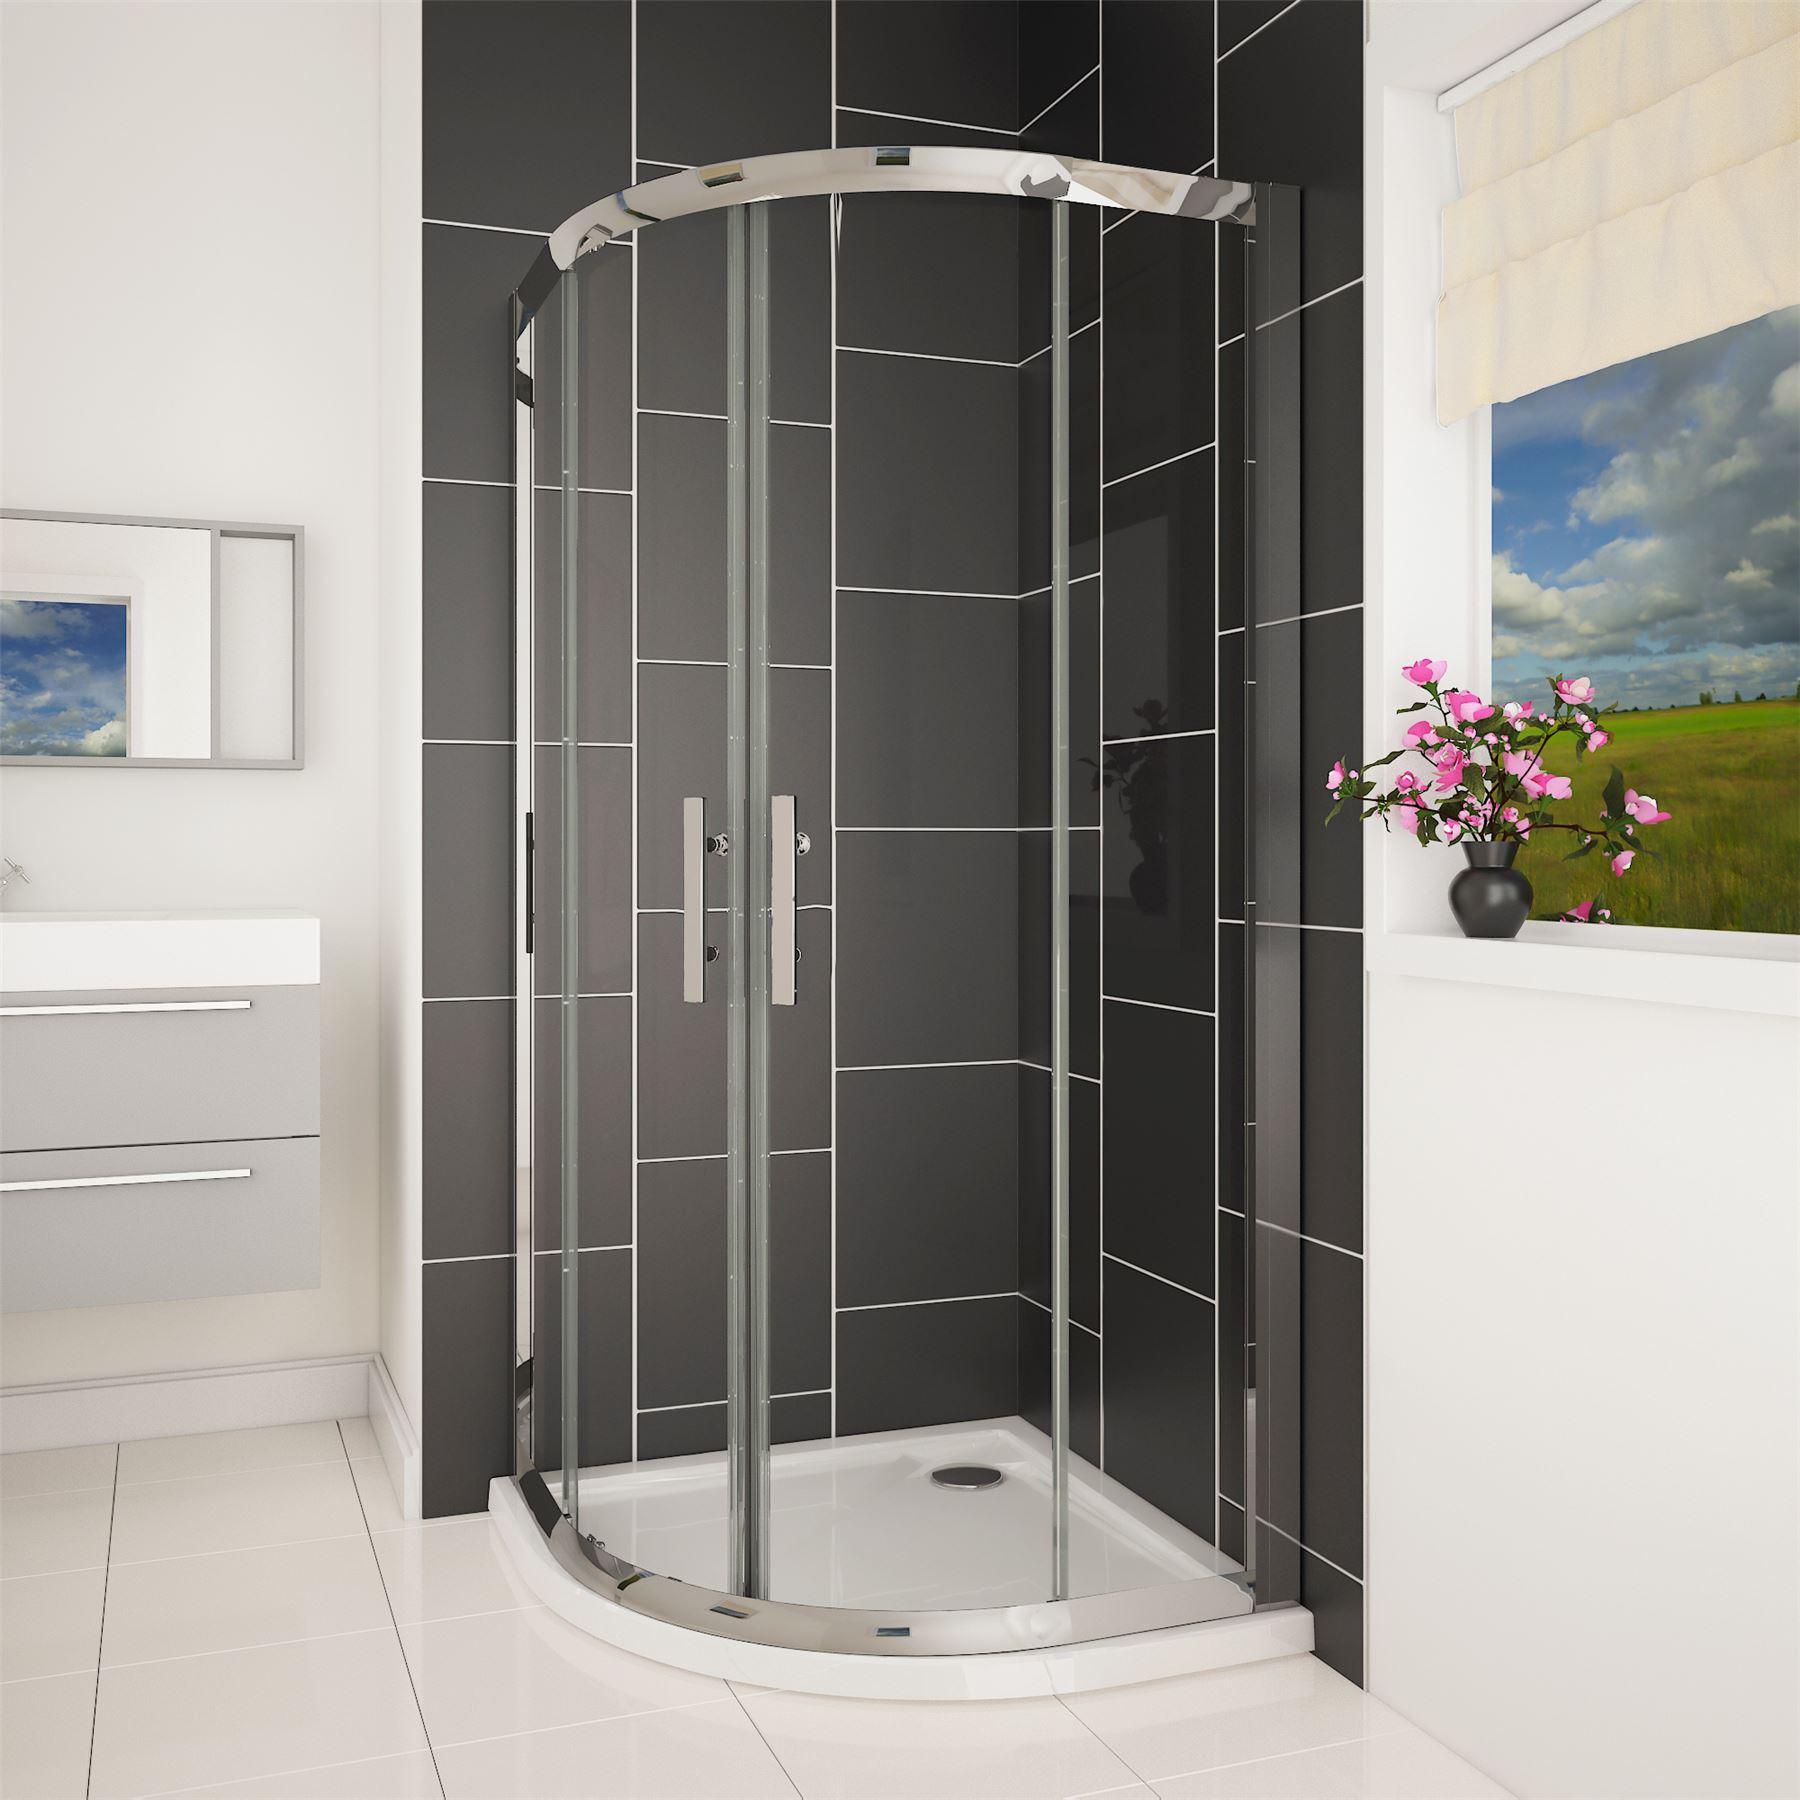 Easy walk in glass quadrant corner sliding door shower enclosure cubicle tray ebay - Walk in glass shower enclosures ...